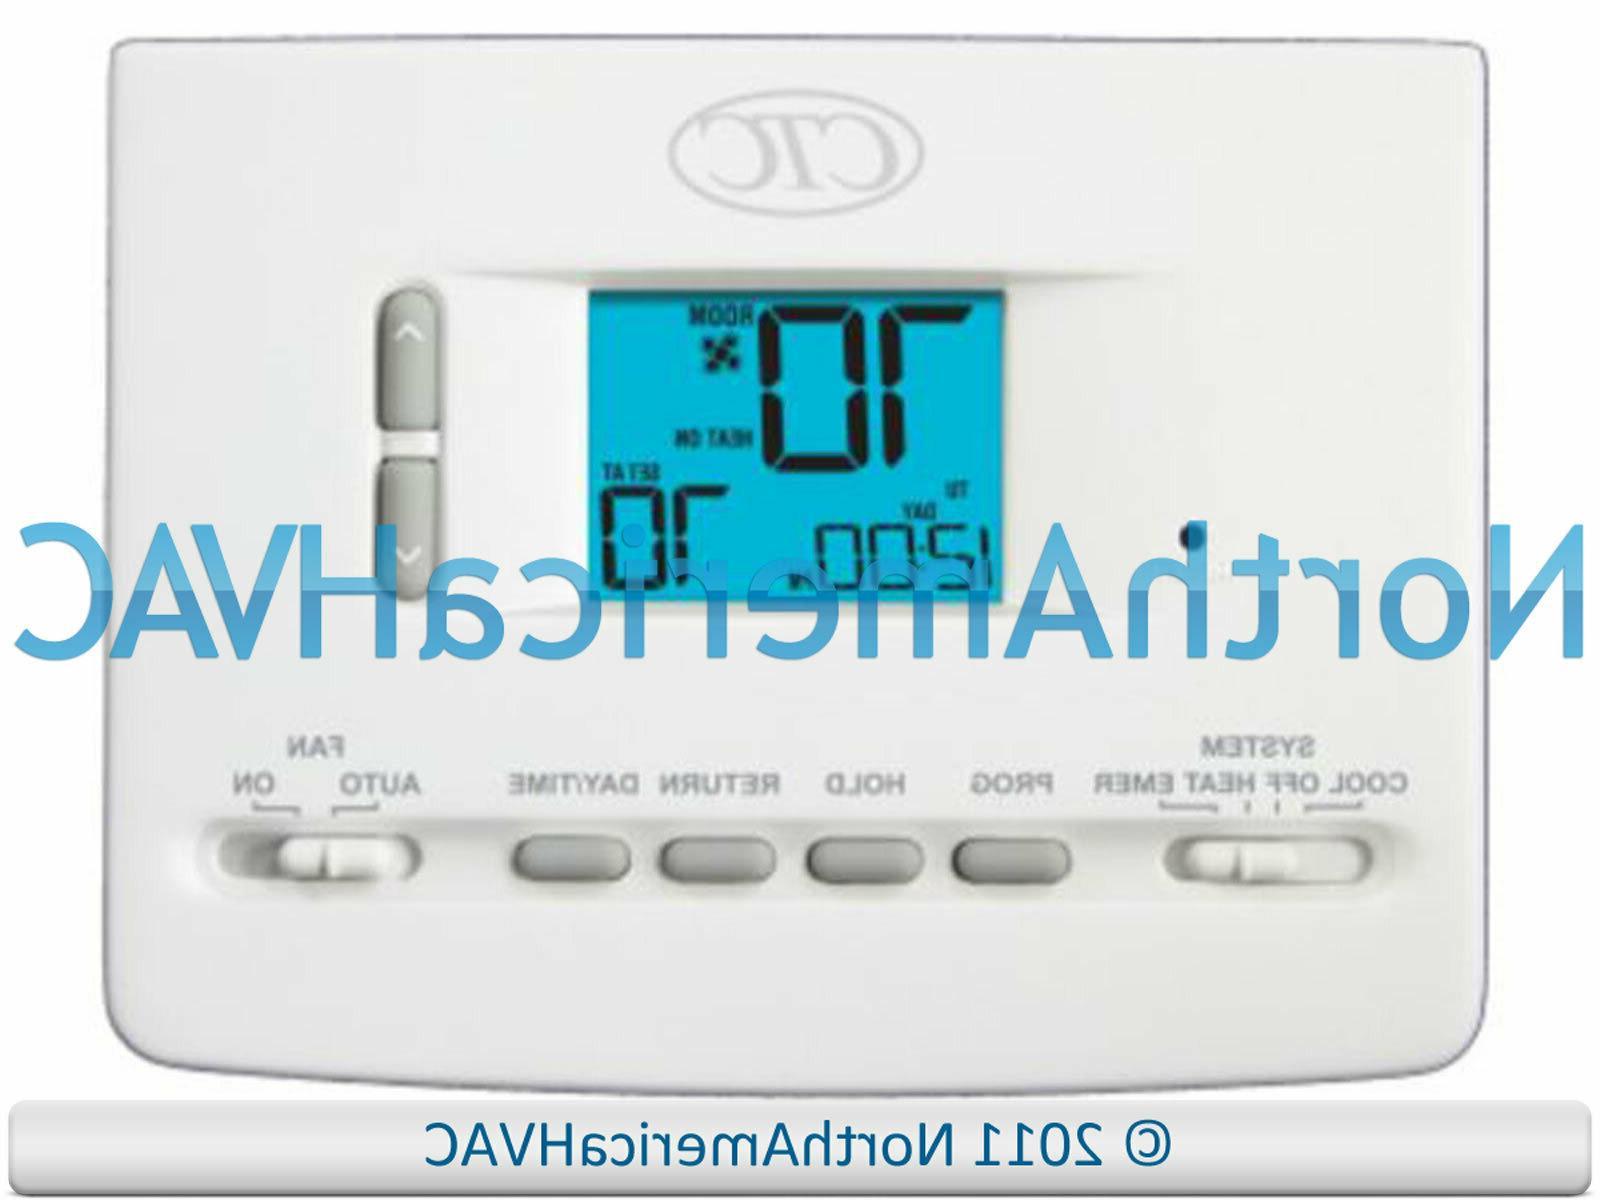 62100n digital home ac hp furnace thermostat